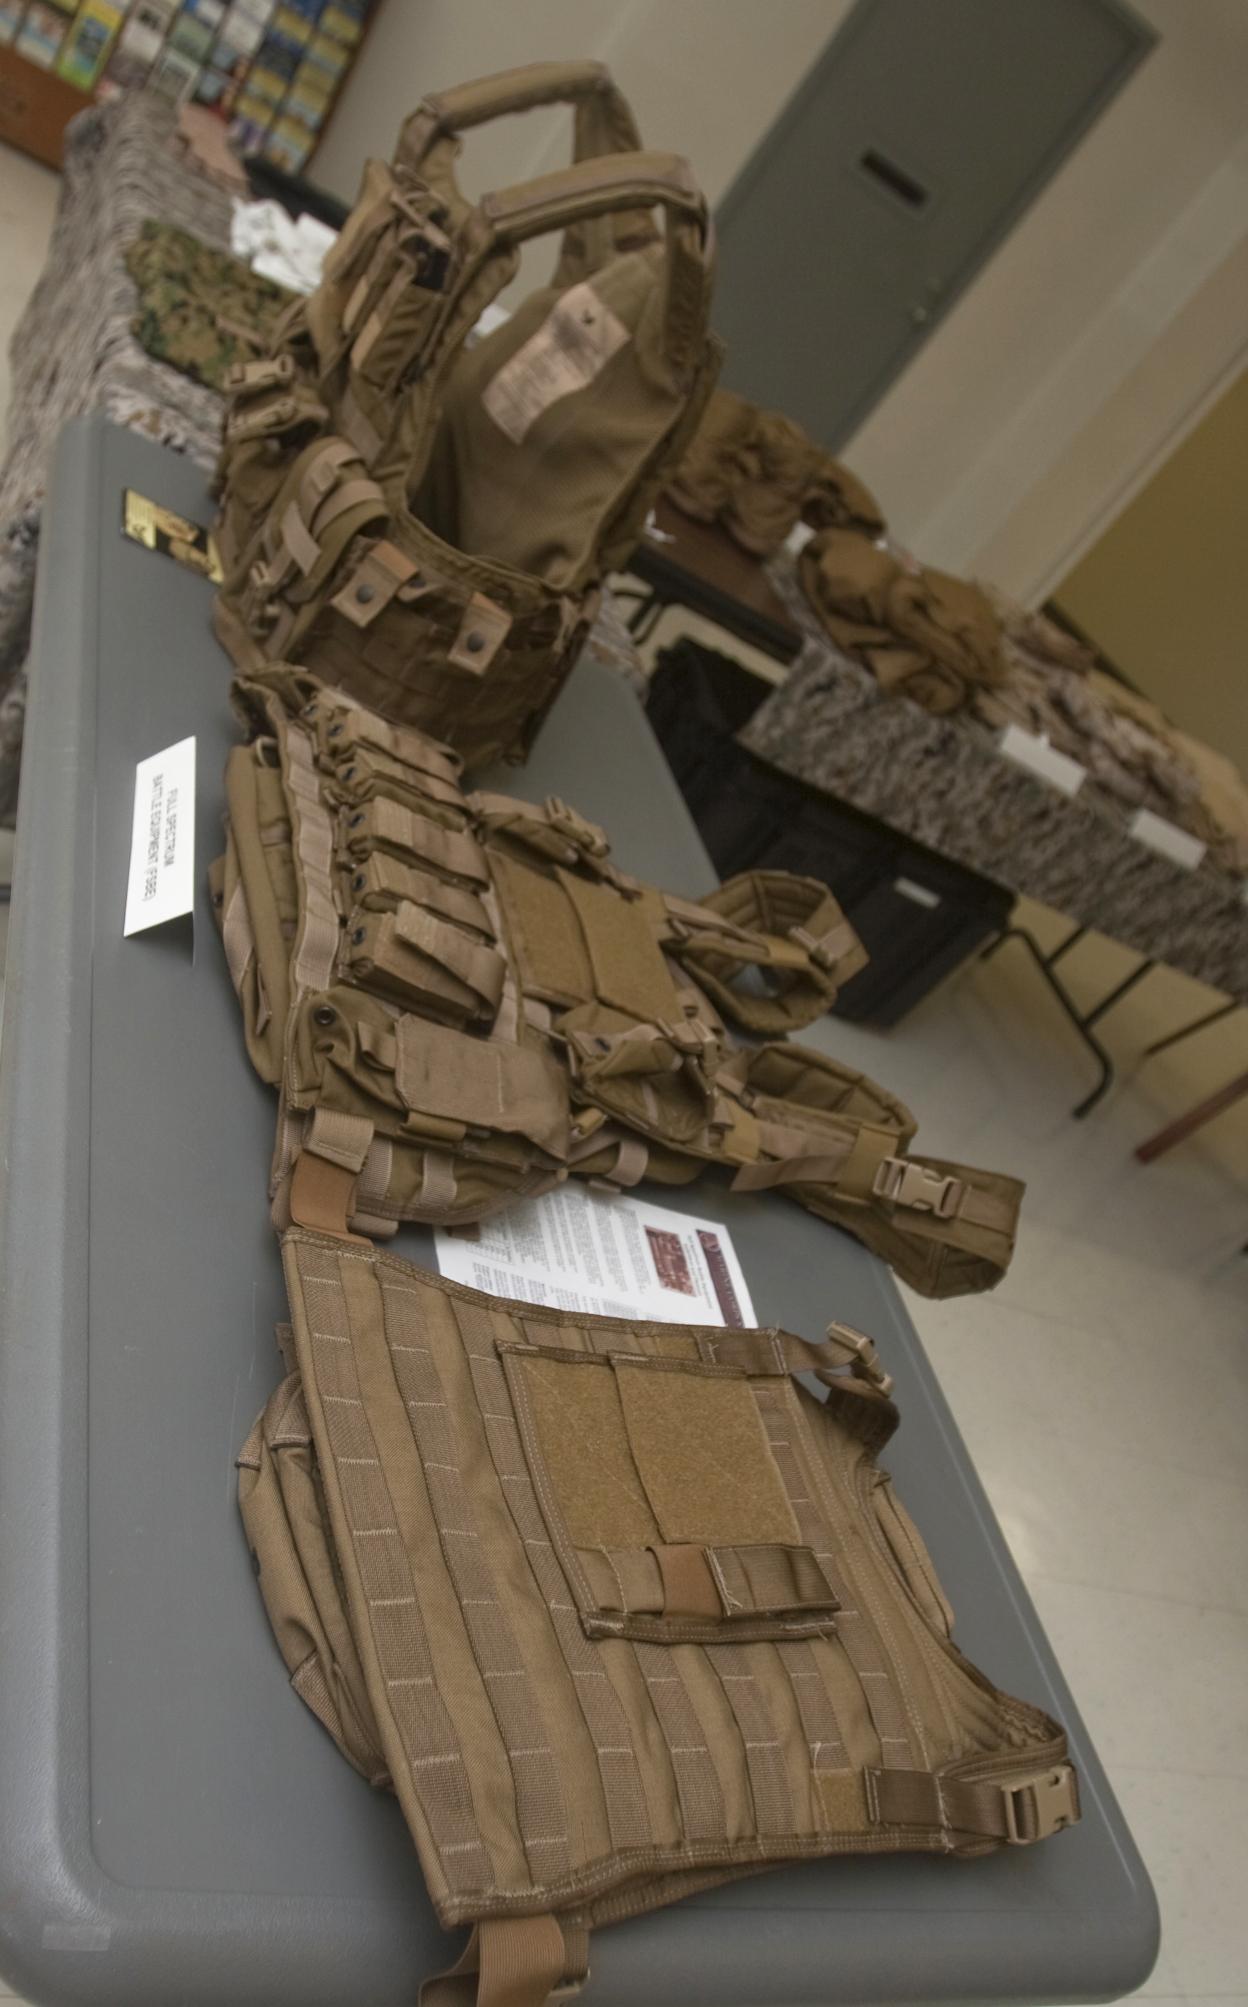 MarForPac gets glimpse at new combat gear > U.S. Marine ...